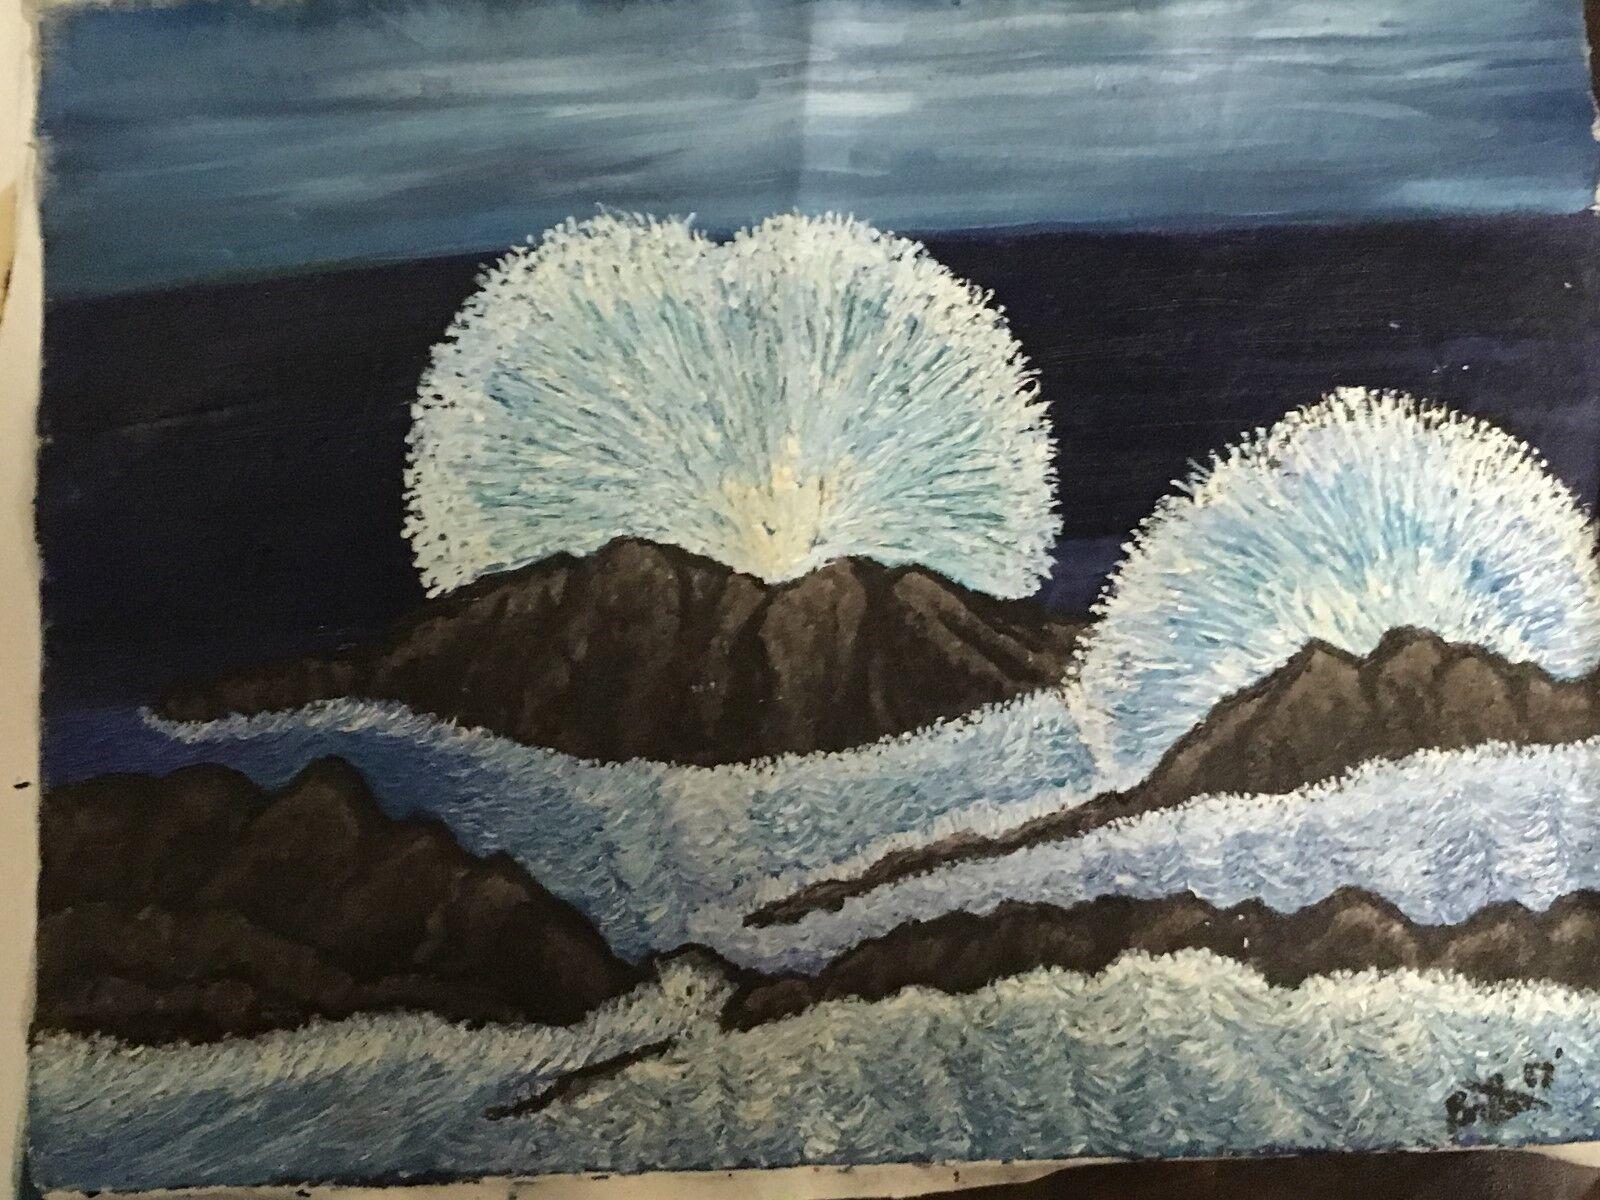 Oil Painting - Storm Surge - $300.00